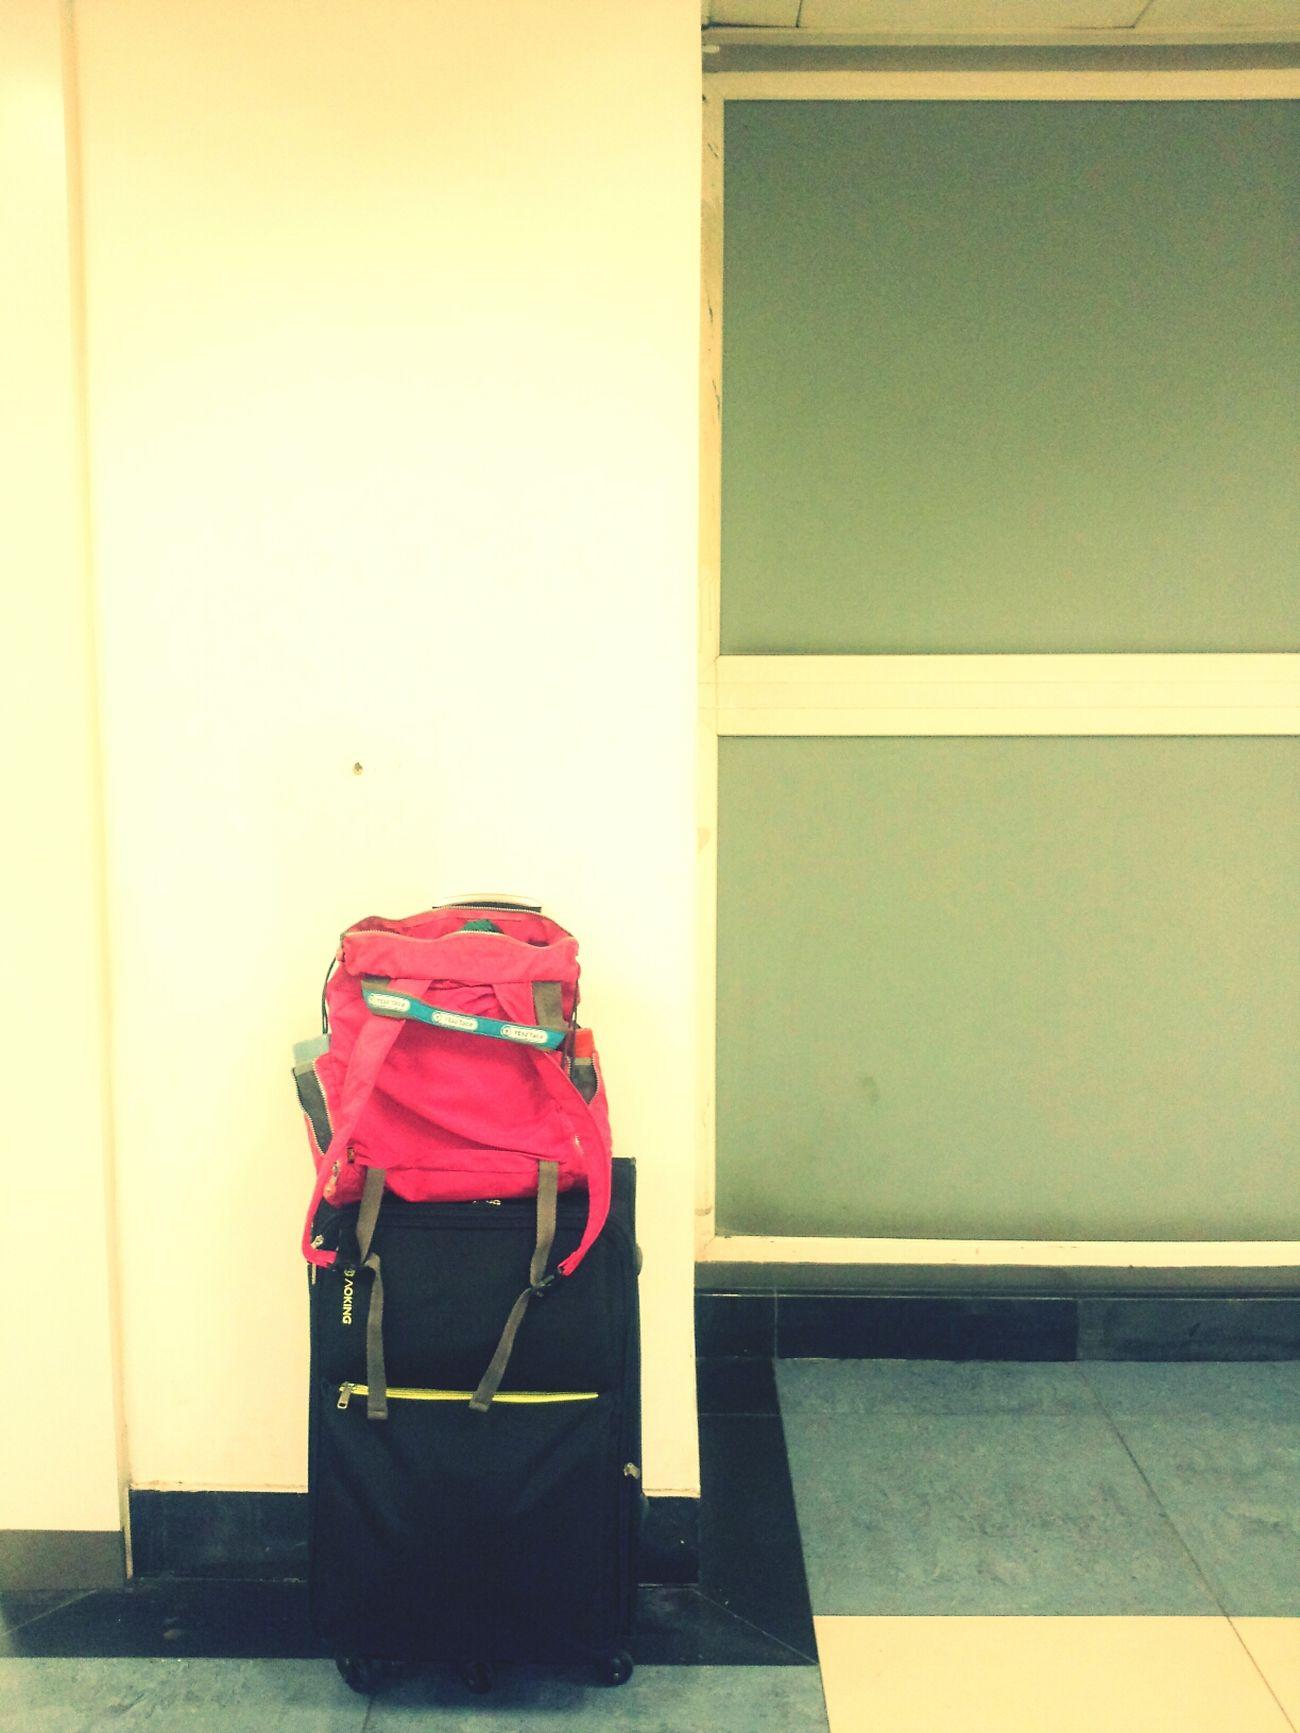 Hanging Out Travel 旅途总有终点,心灵用不停息。^ ^